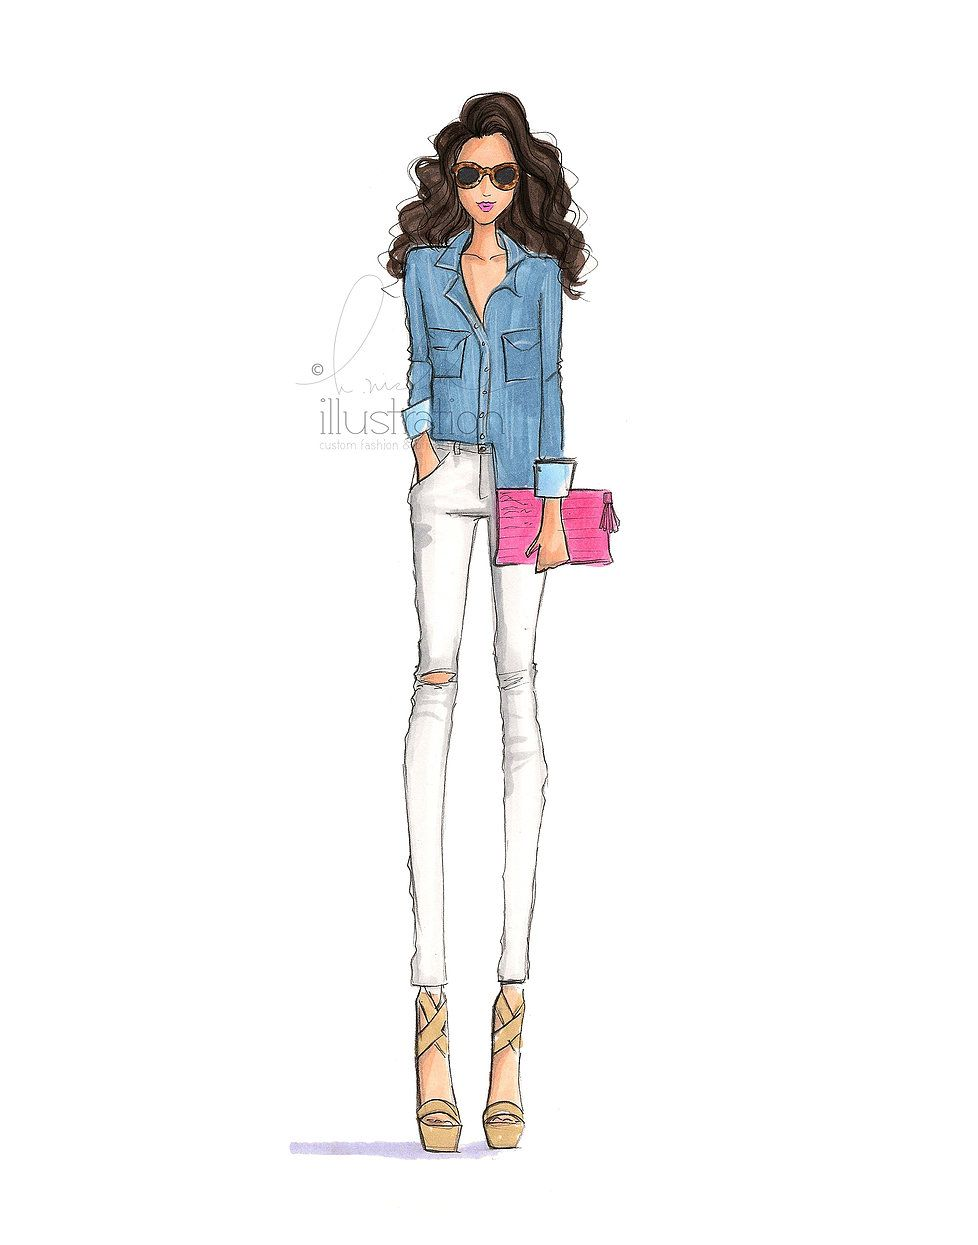 H Nichols Illustration Fashion Sketches Dresses Illustration Fashion Design Fashion Illustration